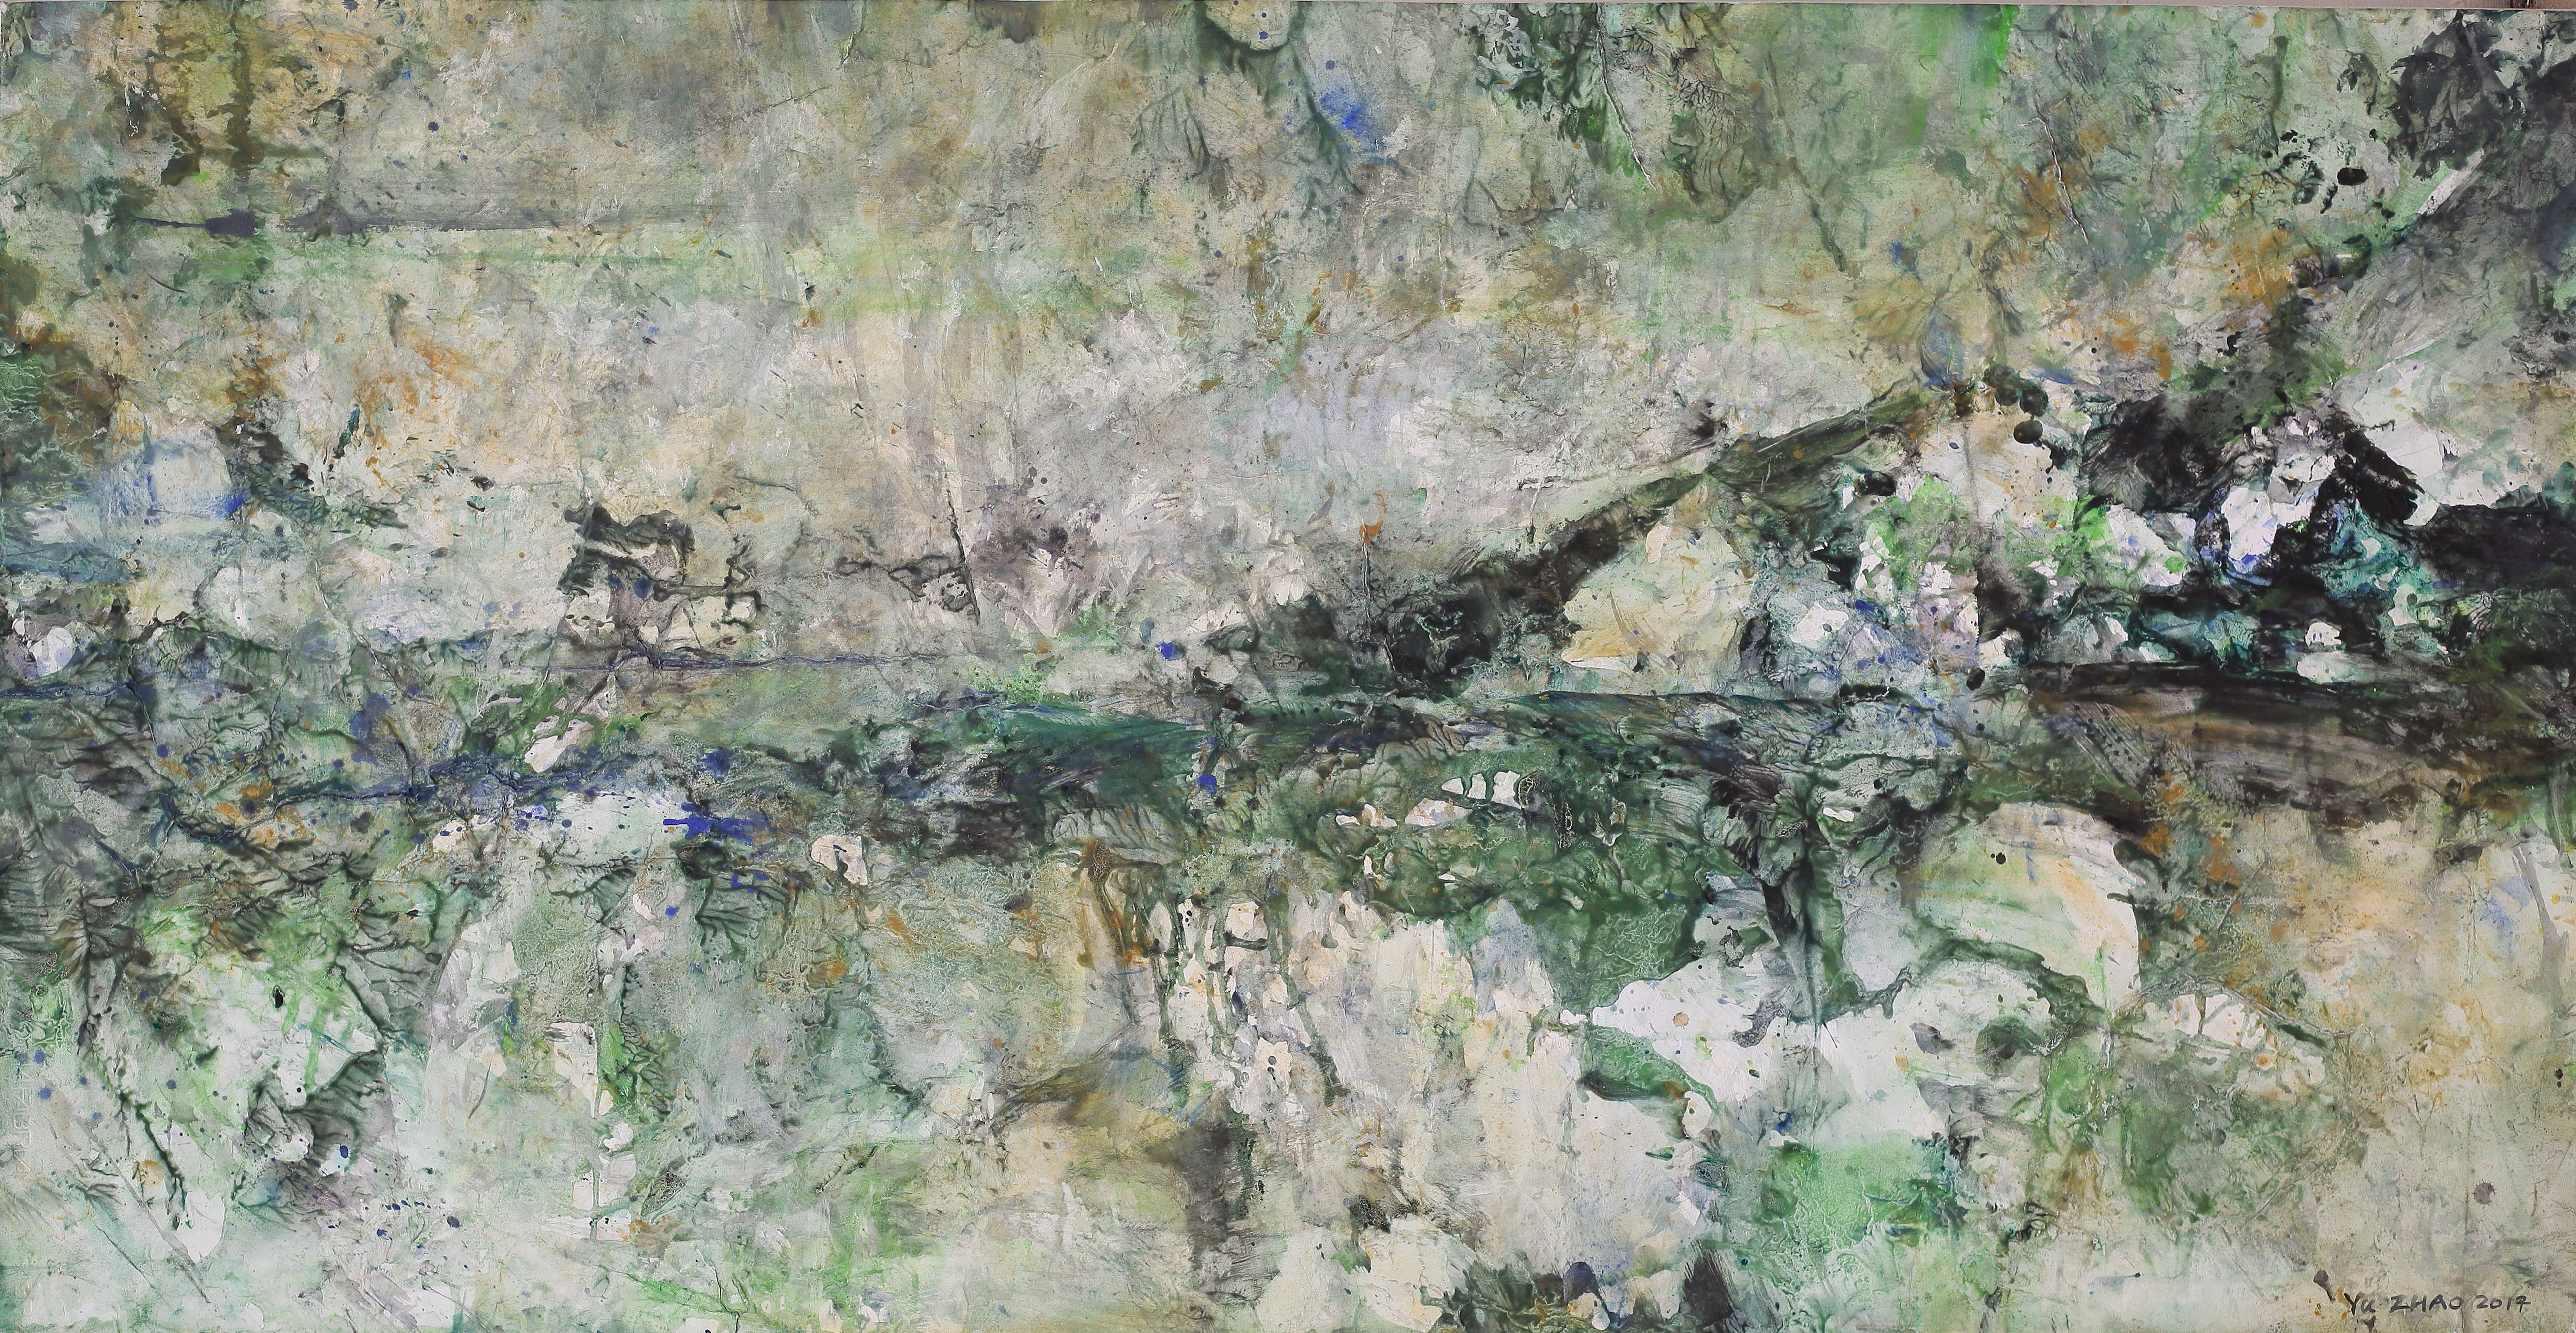 Yu Zhao, L'après-midi d'un faune, tempera/paper/canvas, 150x75cm, 2017